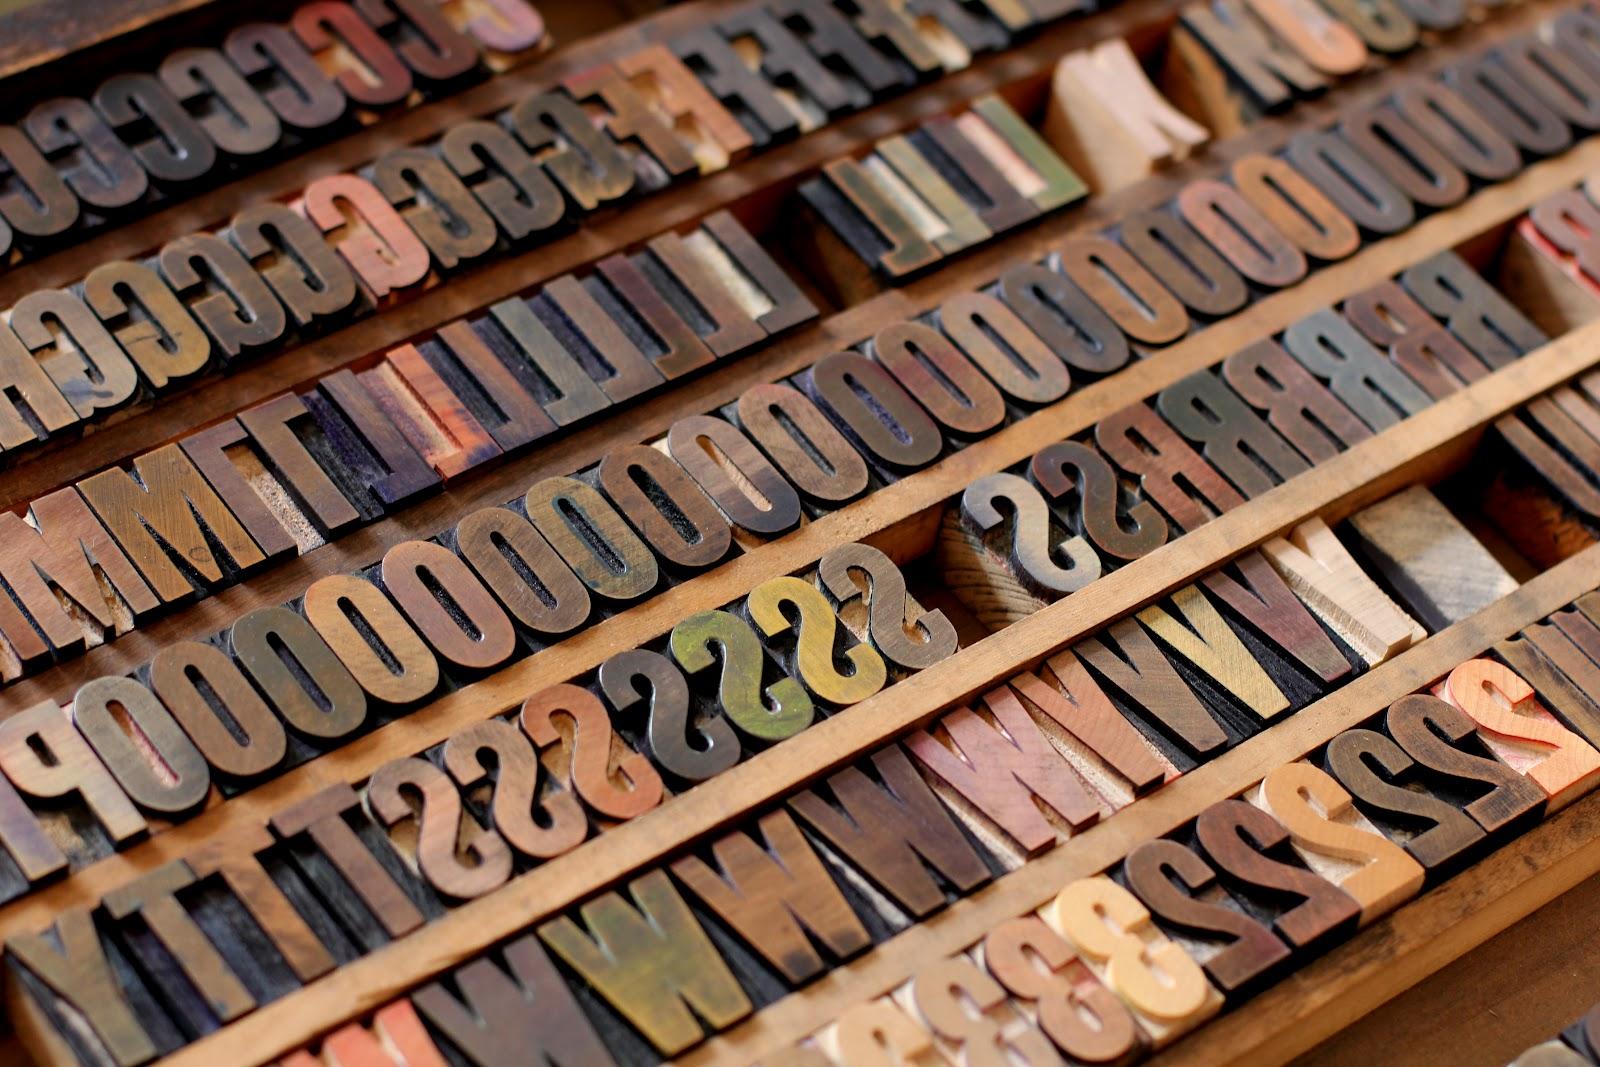 I caratteri tipografici